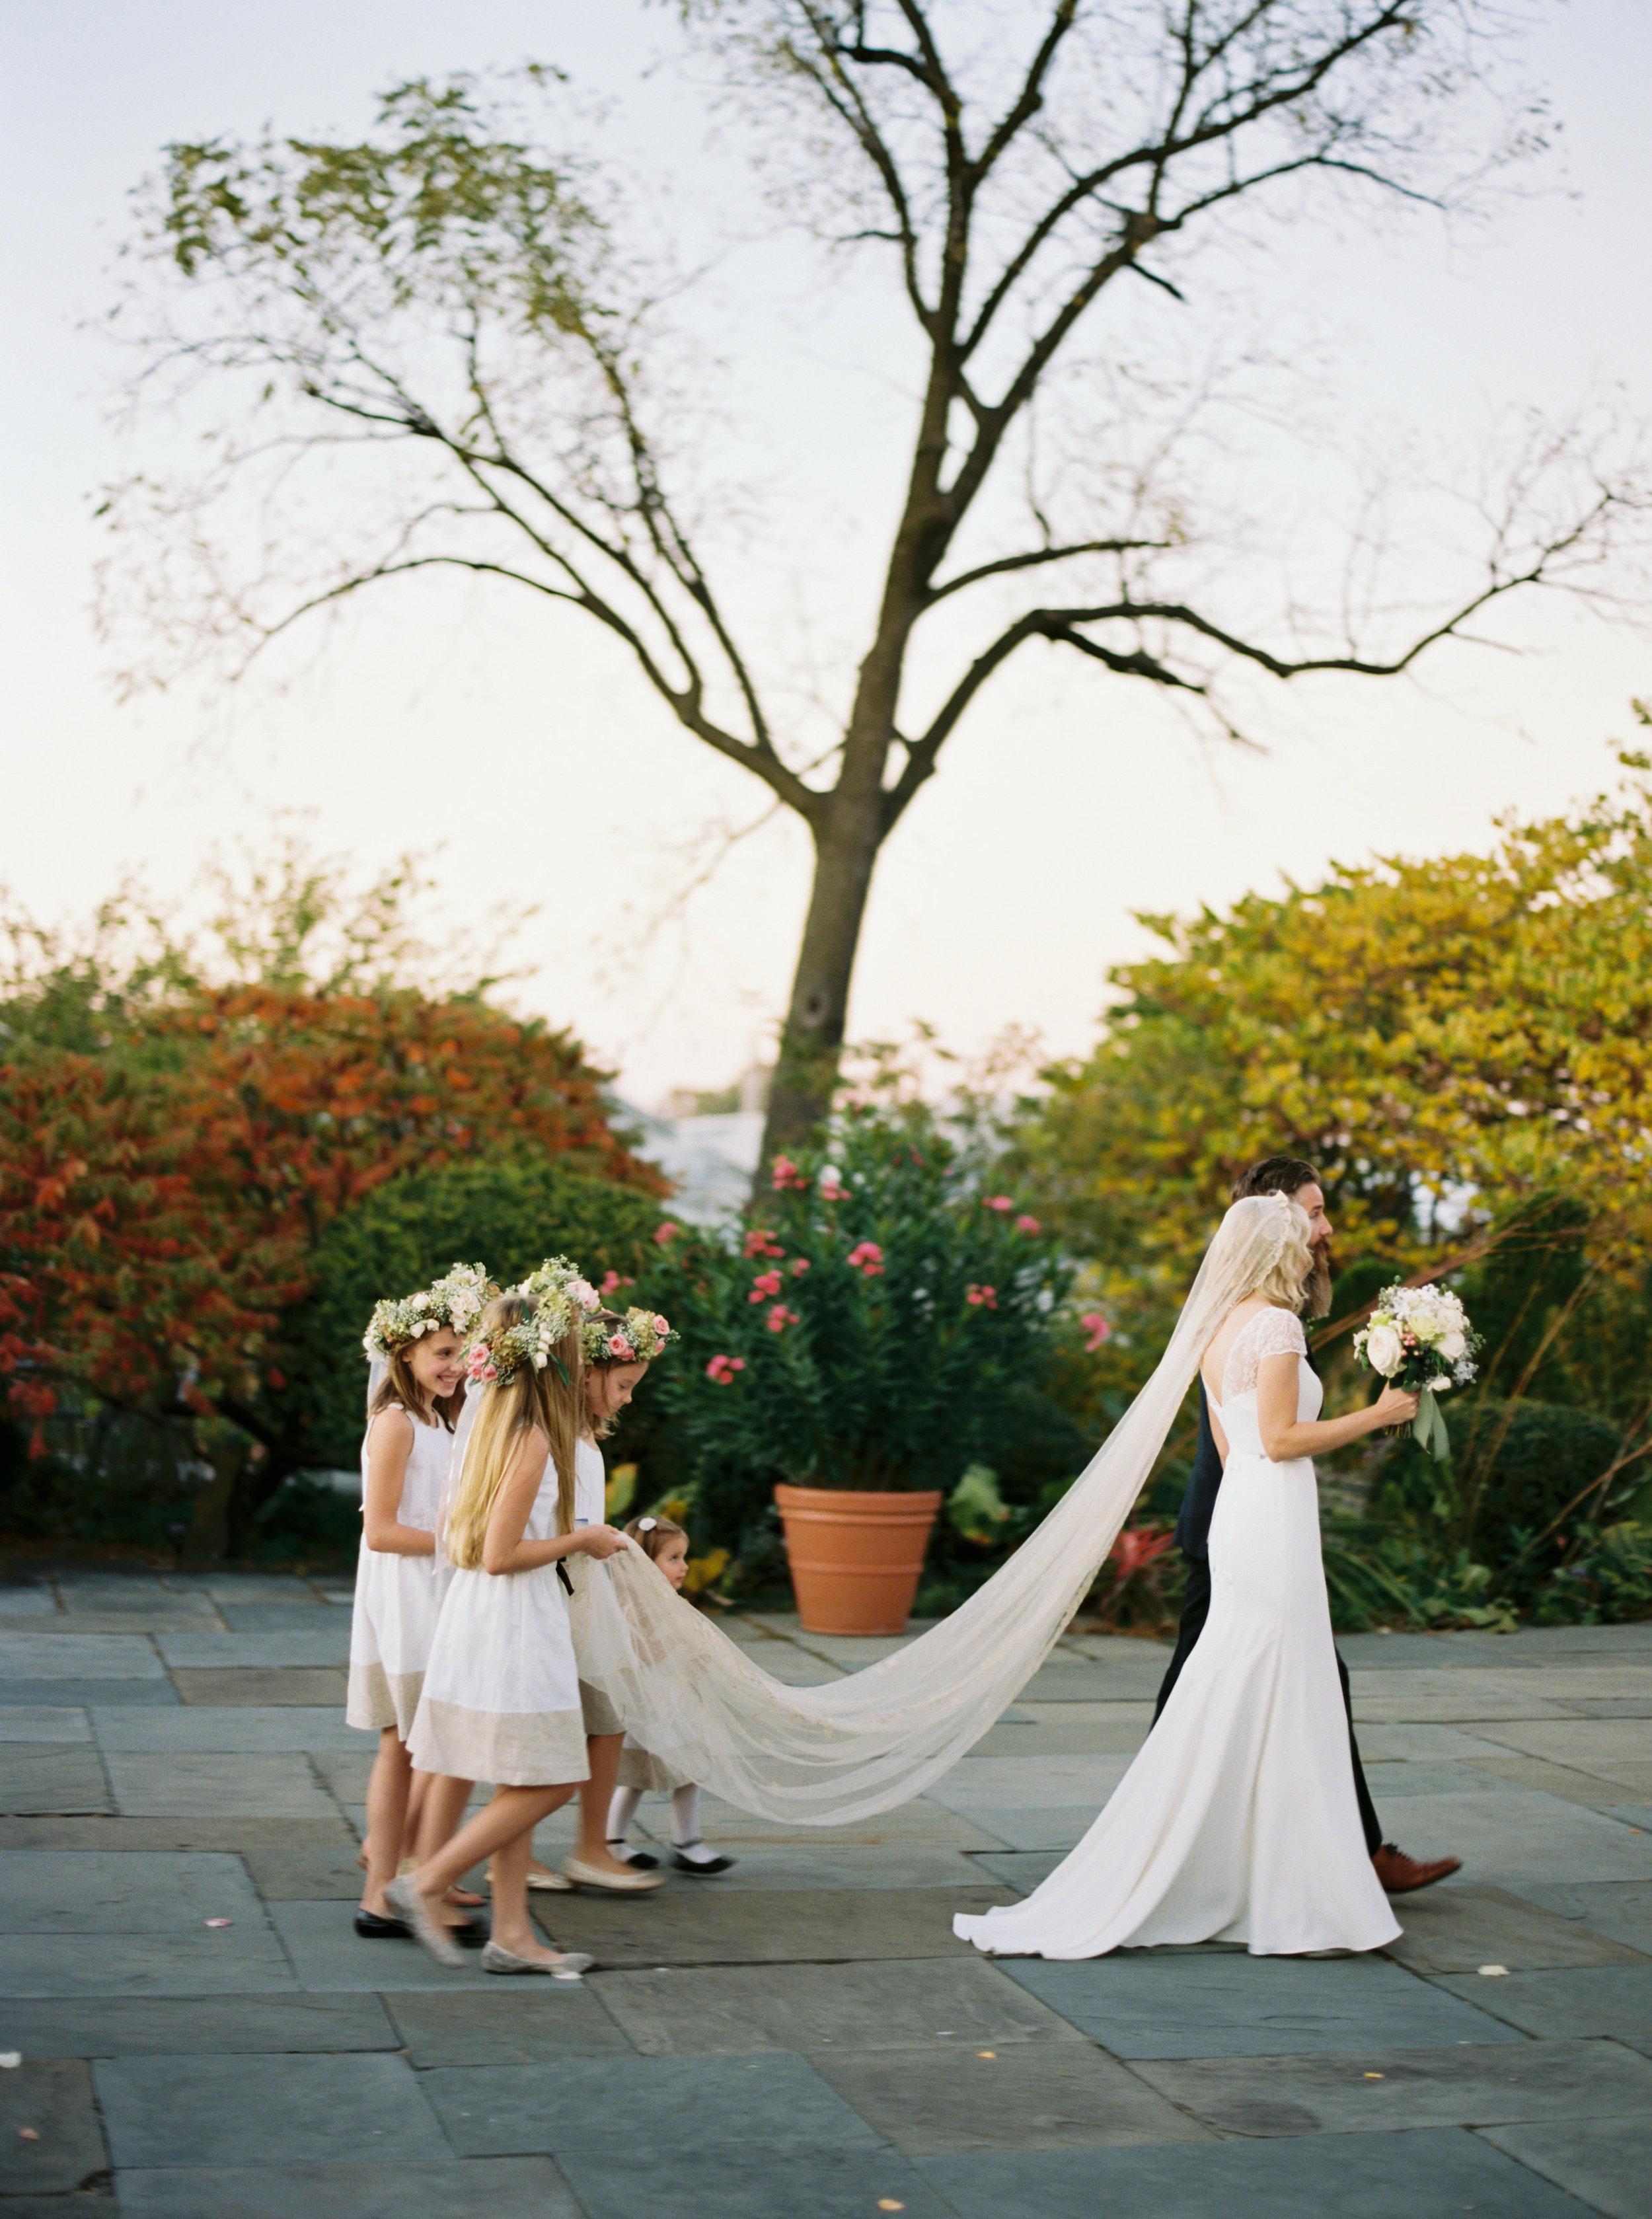 Kyle John l Fine Art Wedding Photography l Chicago, Copenhagen, California, New York, Destination l Blog l Alice & Aaron_16